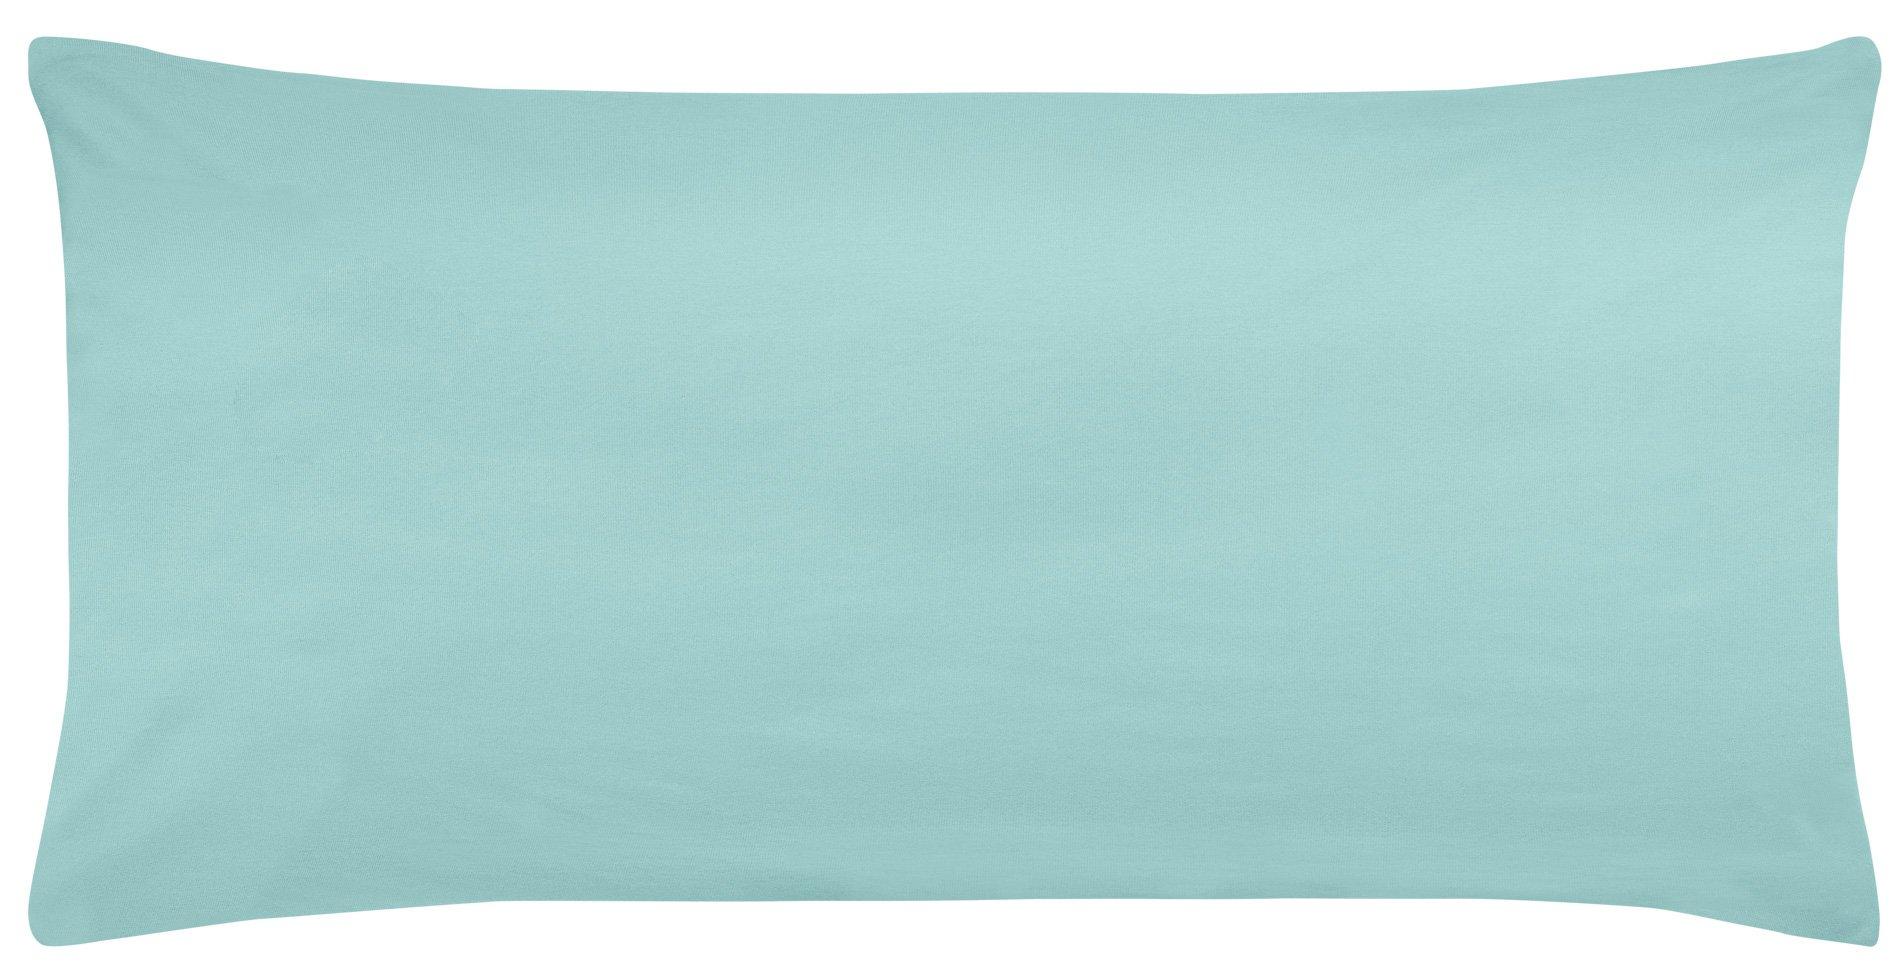 Edel-Zwirn-Jersey aqua B40cm